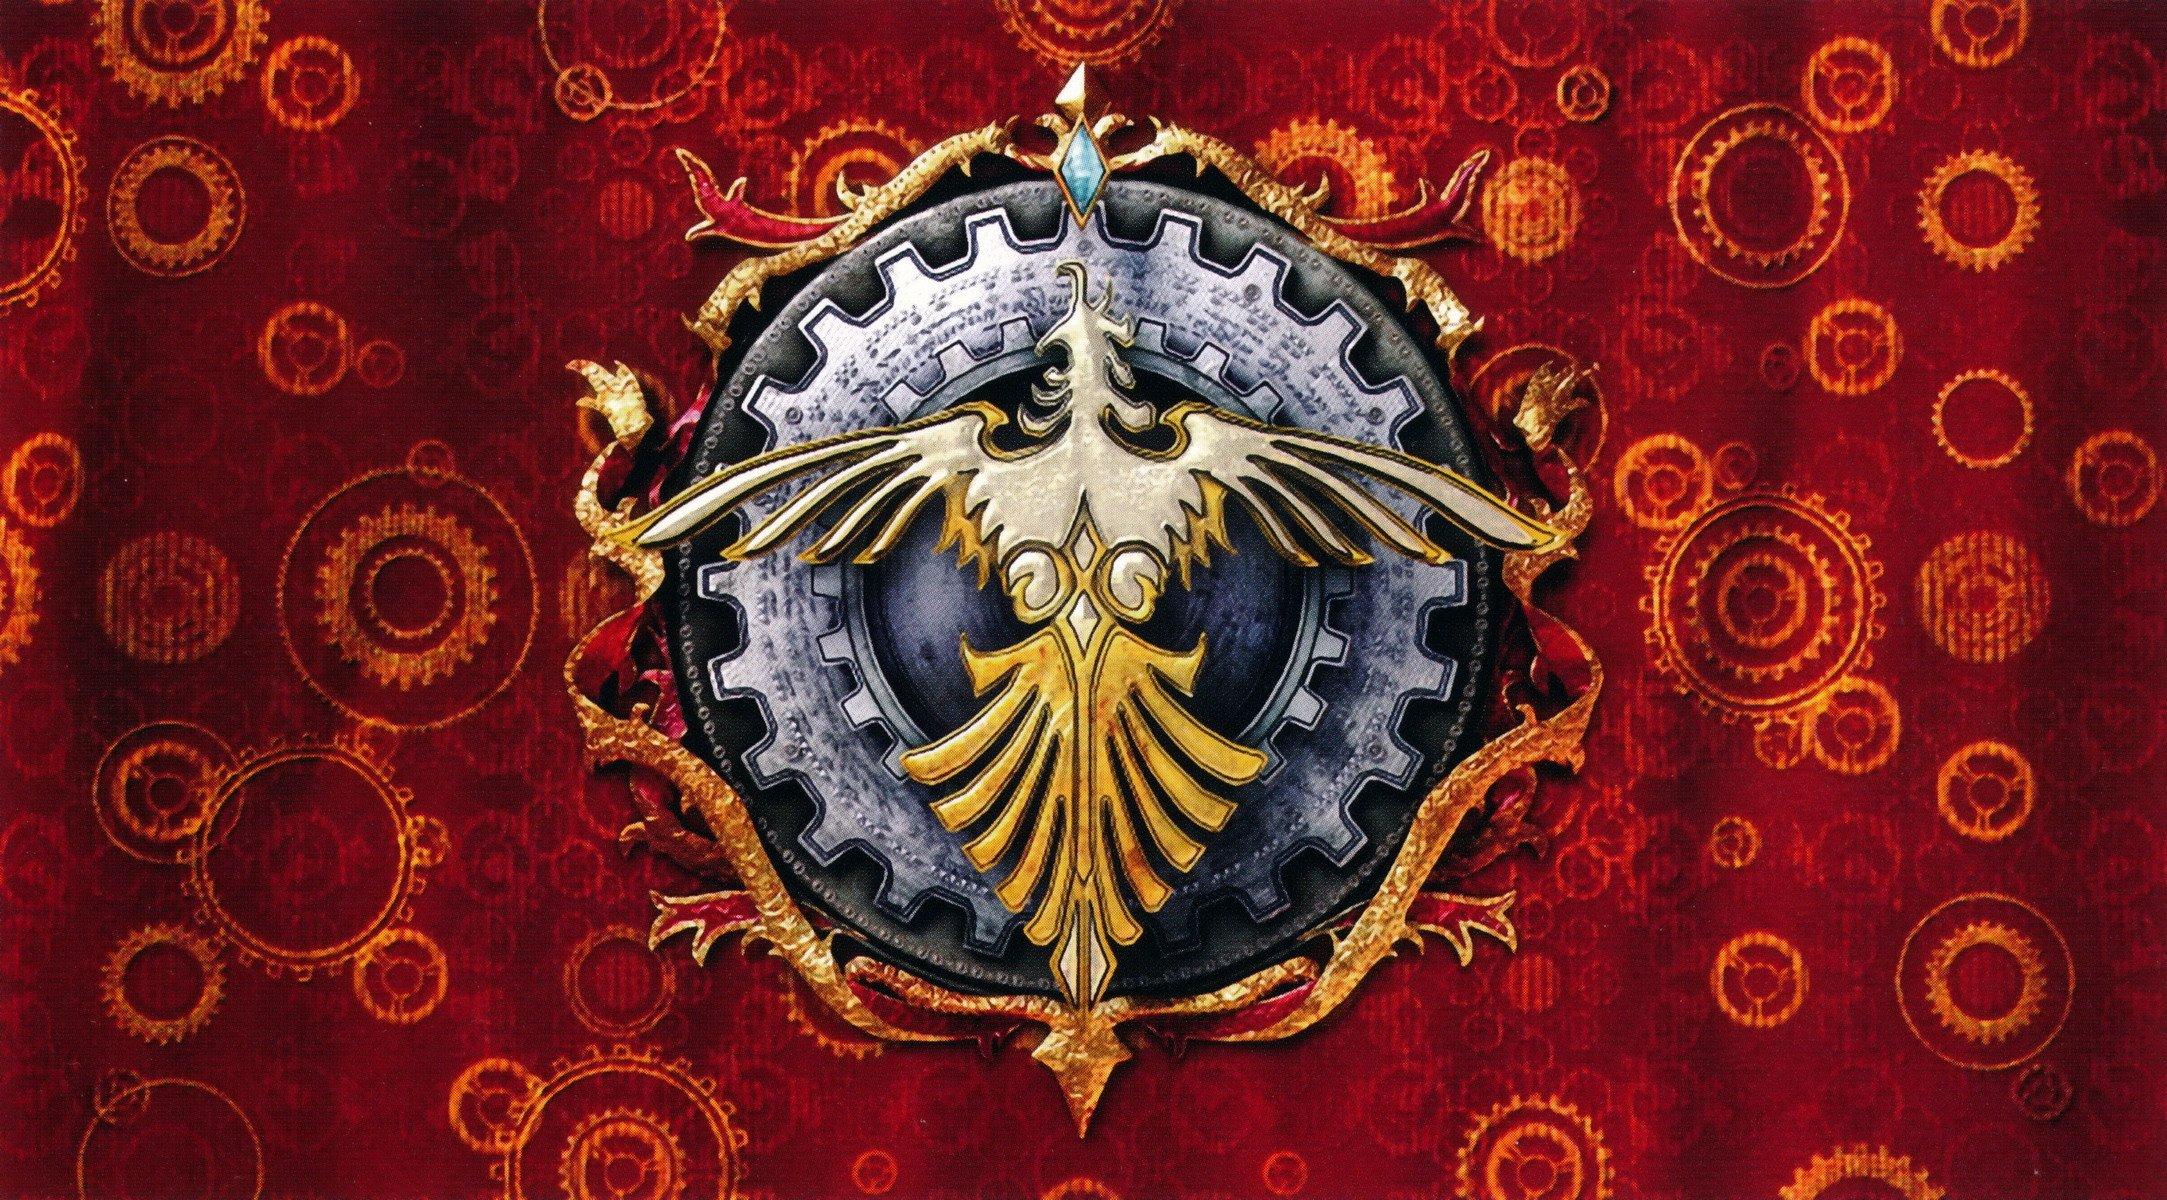 Unduh 60 Wallpaper Final Fantasy Type O Gratis